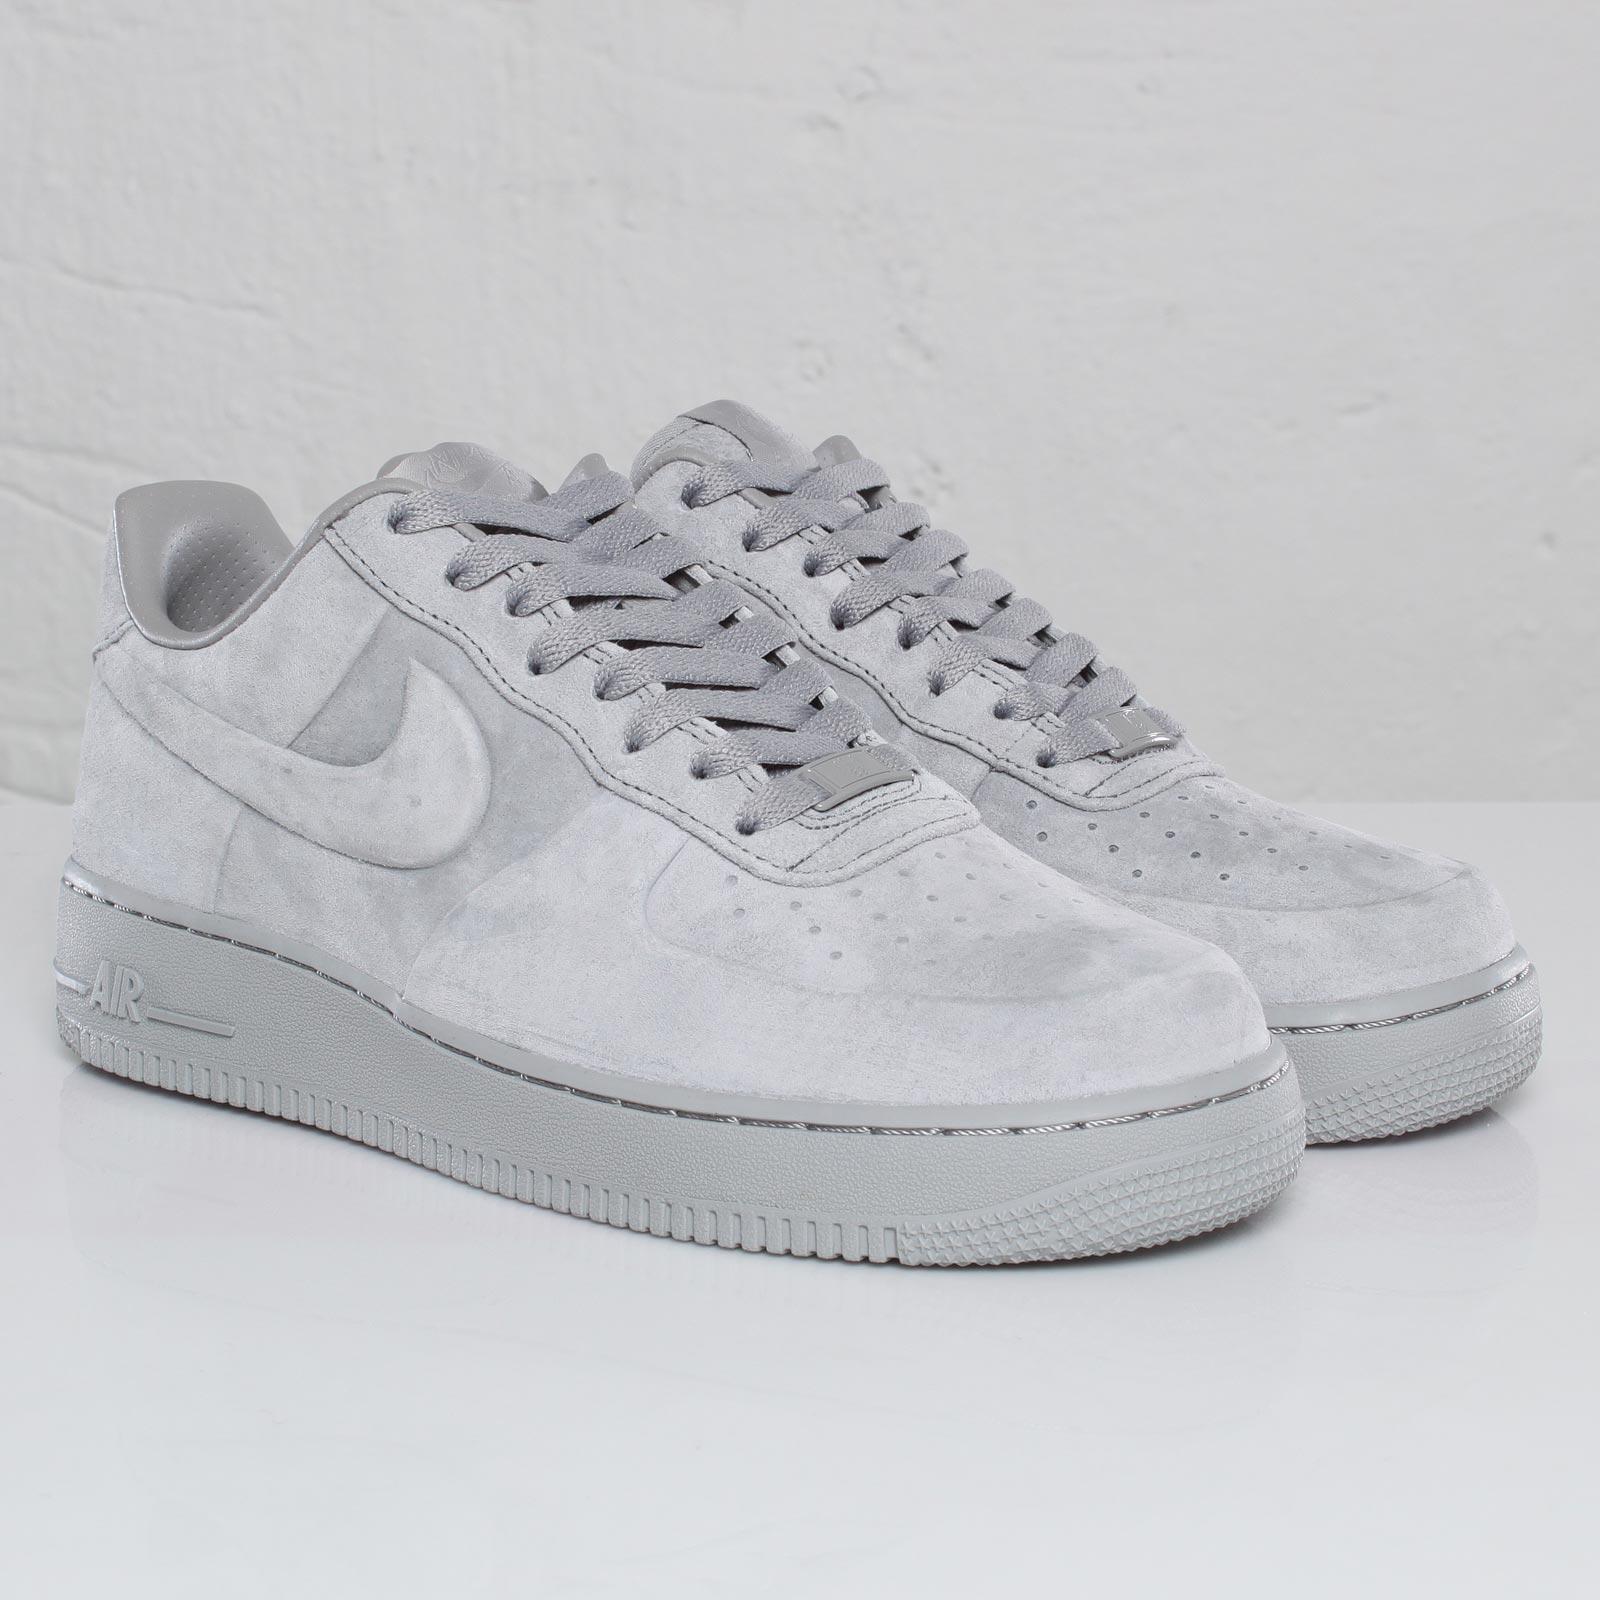 7dce50363f0db Nike Air Force 1 Low VT Prm - 102765 - Sneakersnstuff   sneakers ...